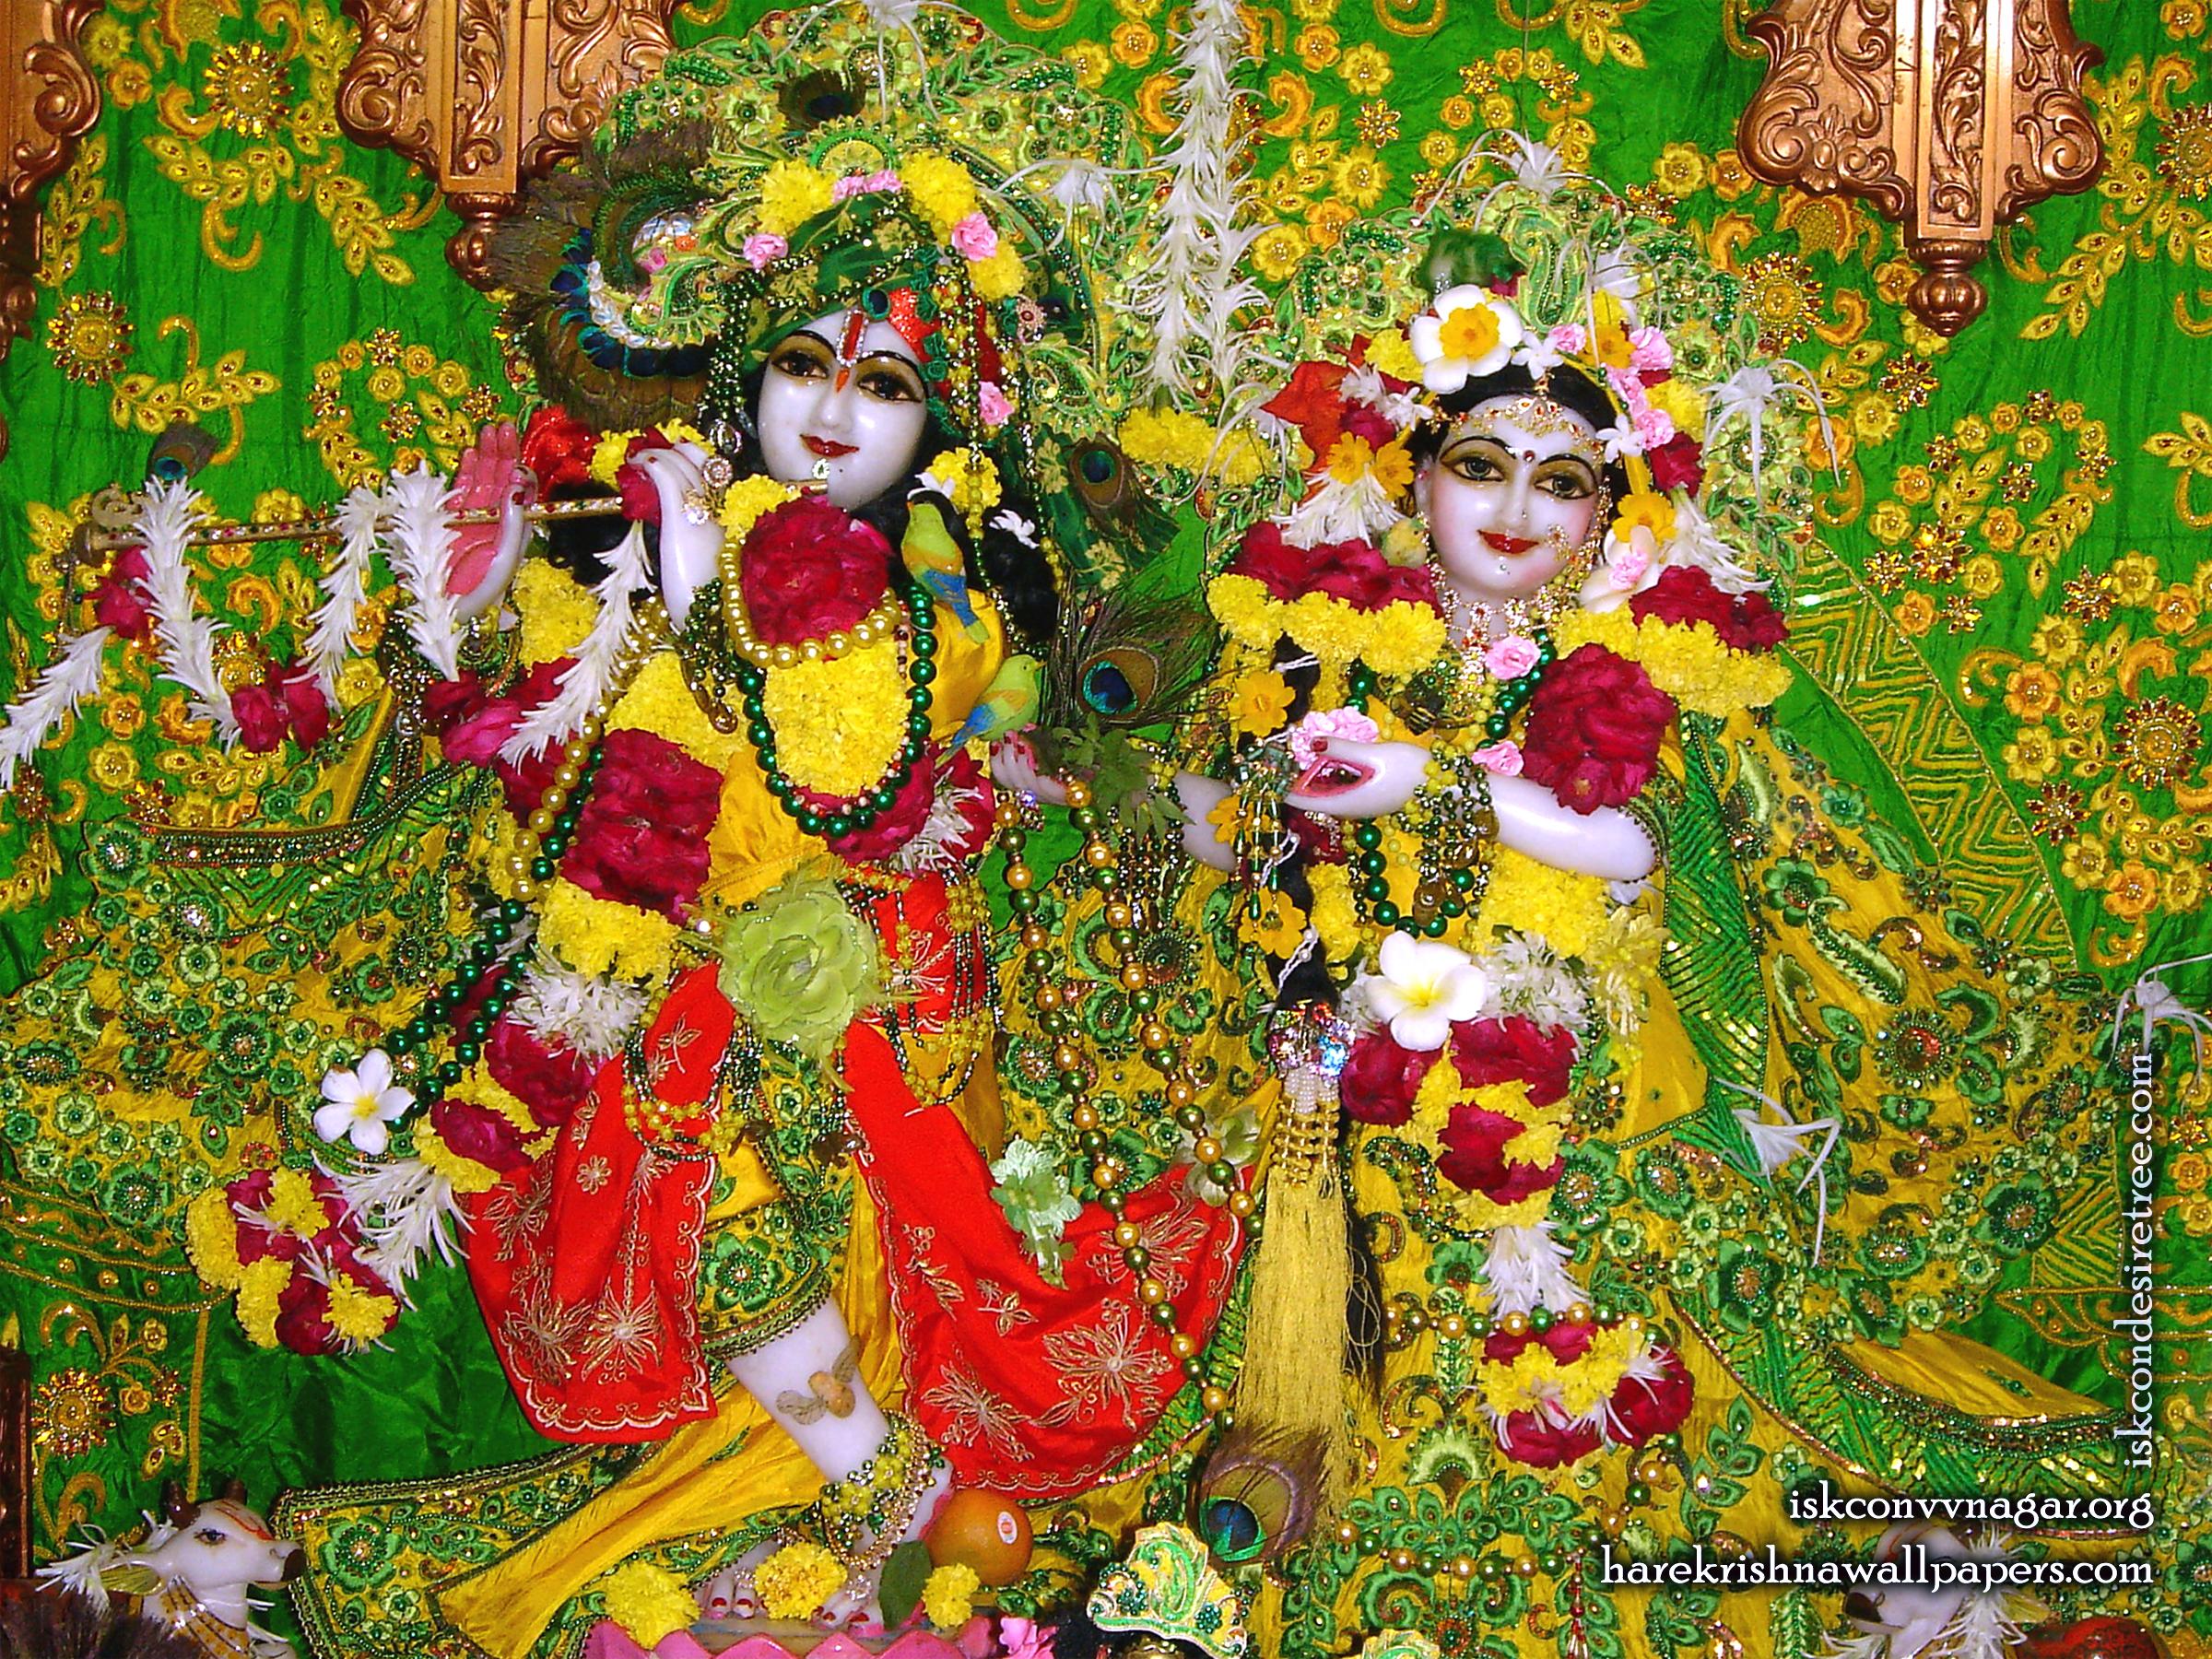 Sri Sri Radha Giridhari Wallpaper (011) Size 2400x1800 Download